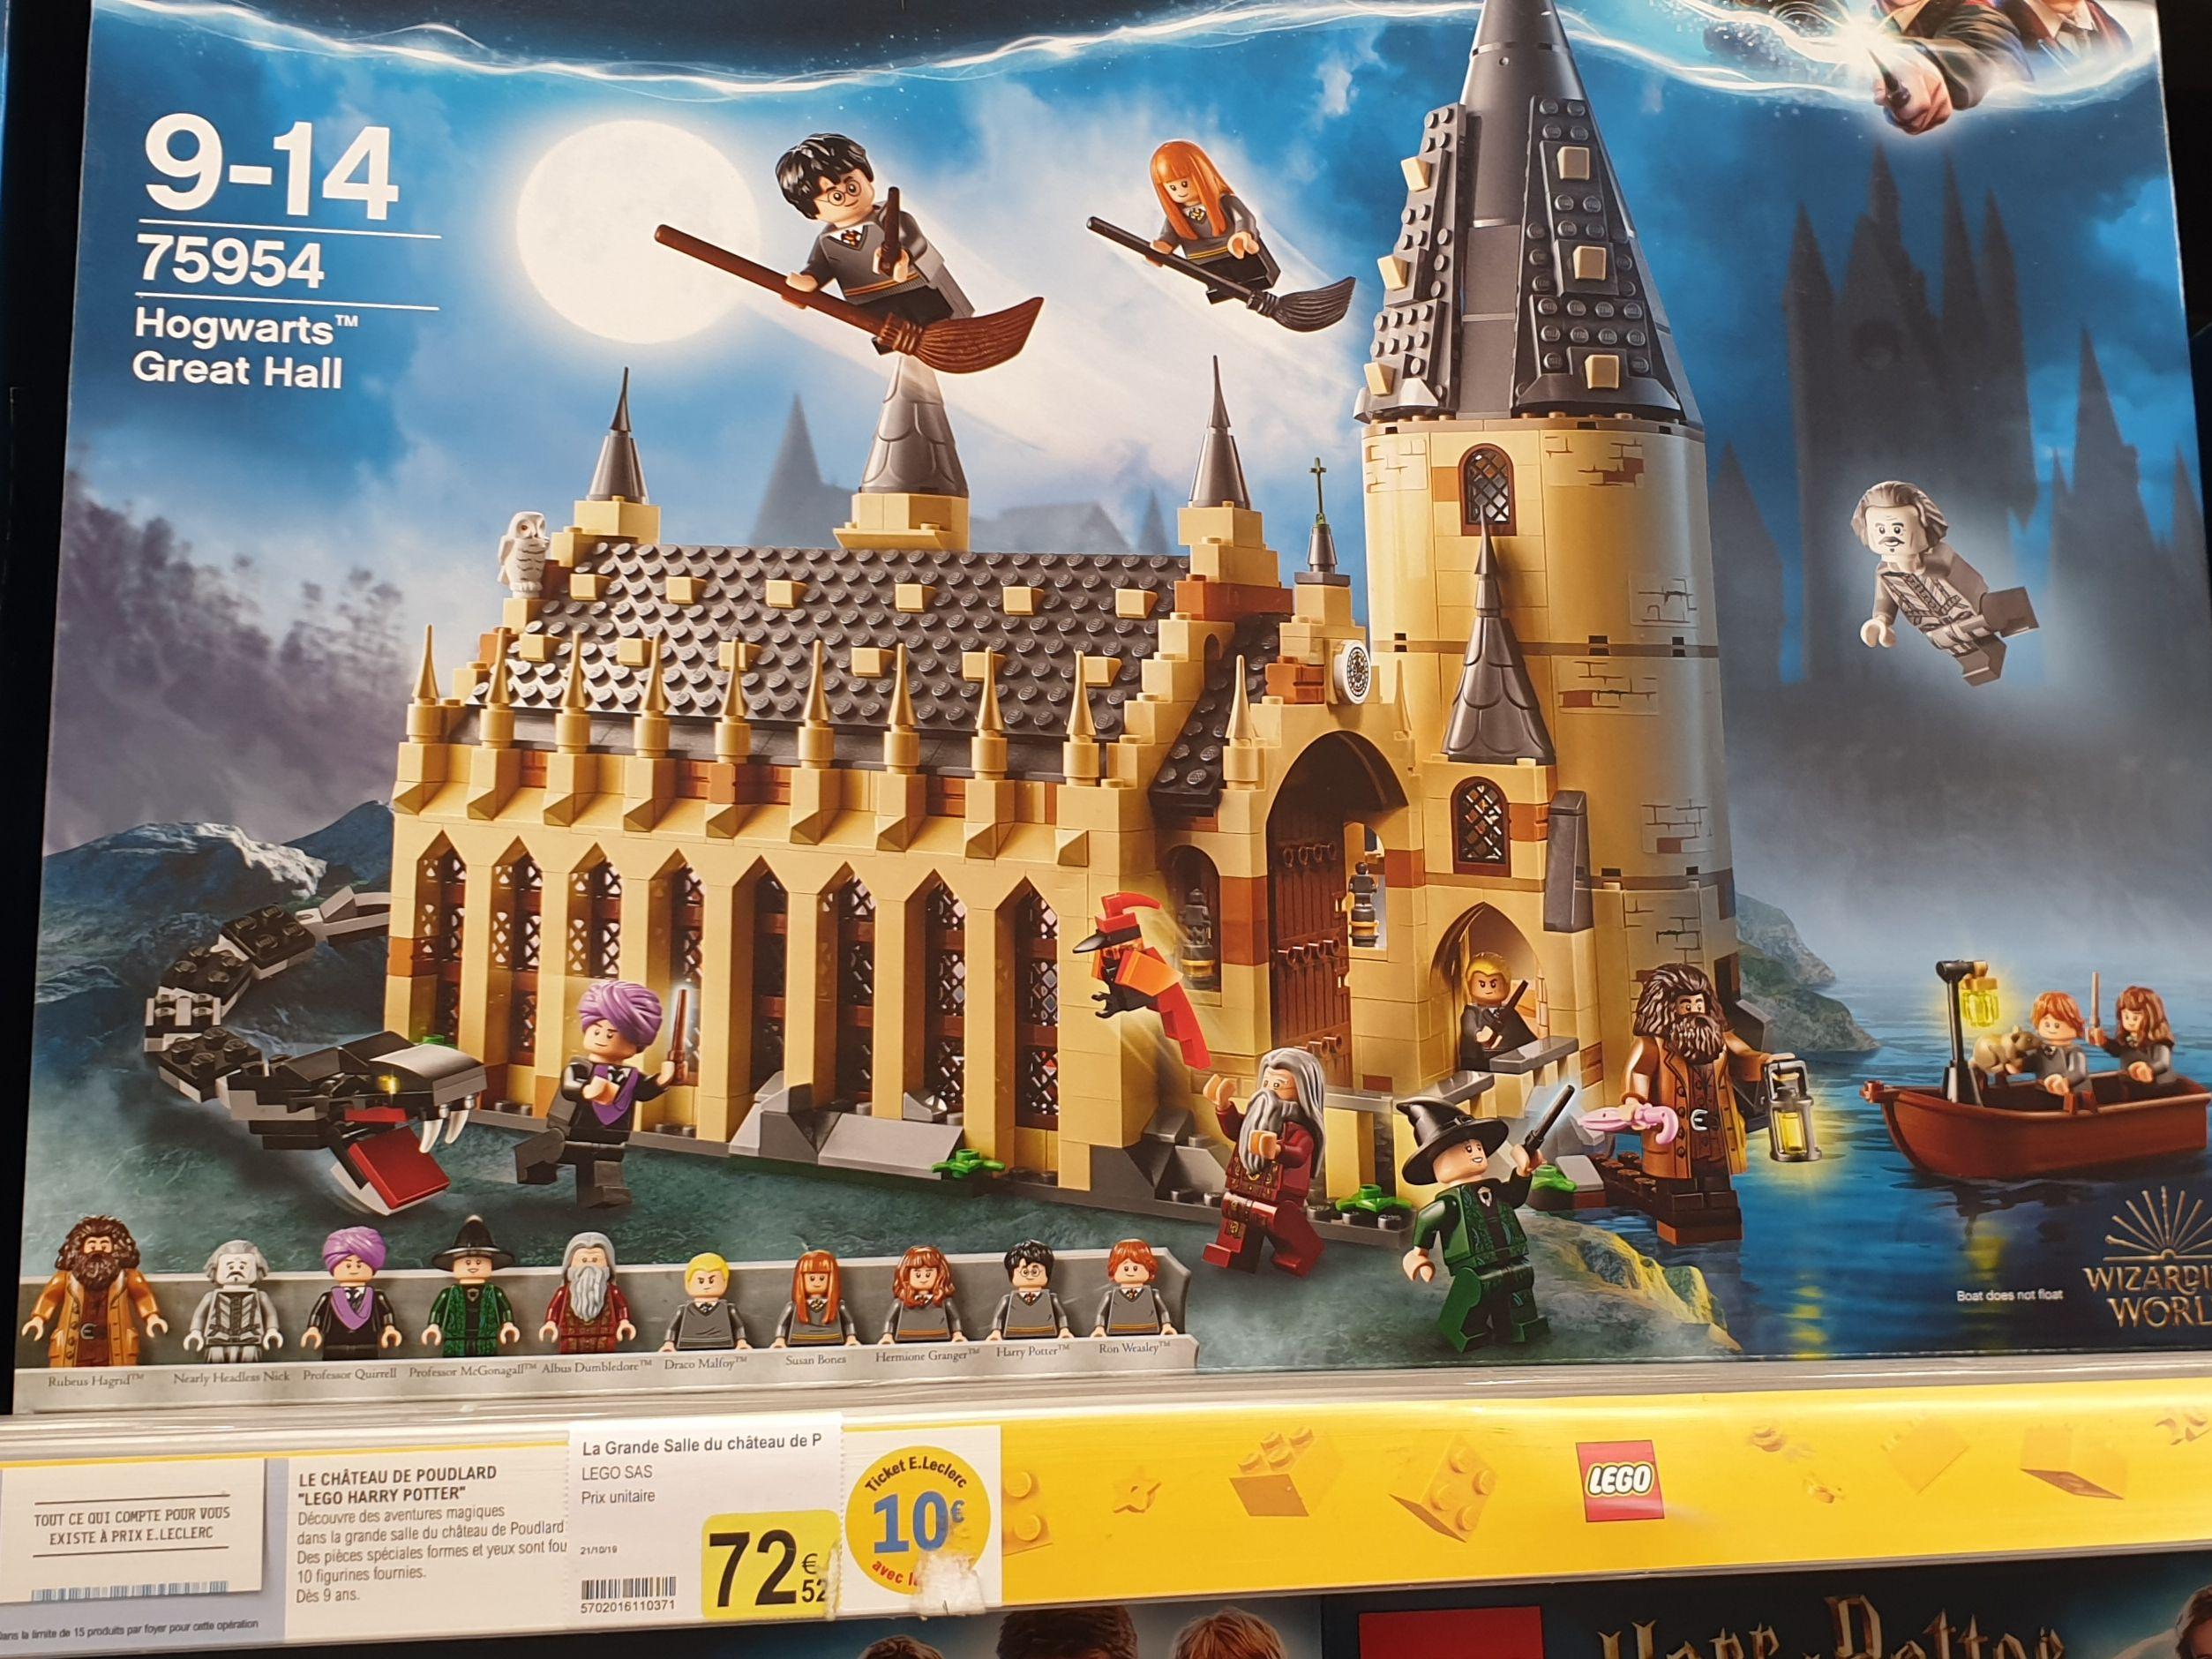 Jeu de construction Lego Harry Potter - Grande salle de Poudlard (via 10€ sur la carte fidélité) - Châteaulin (29)